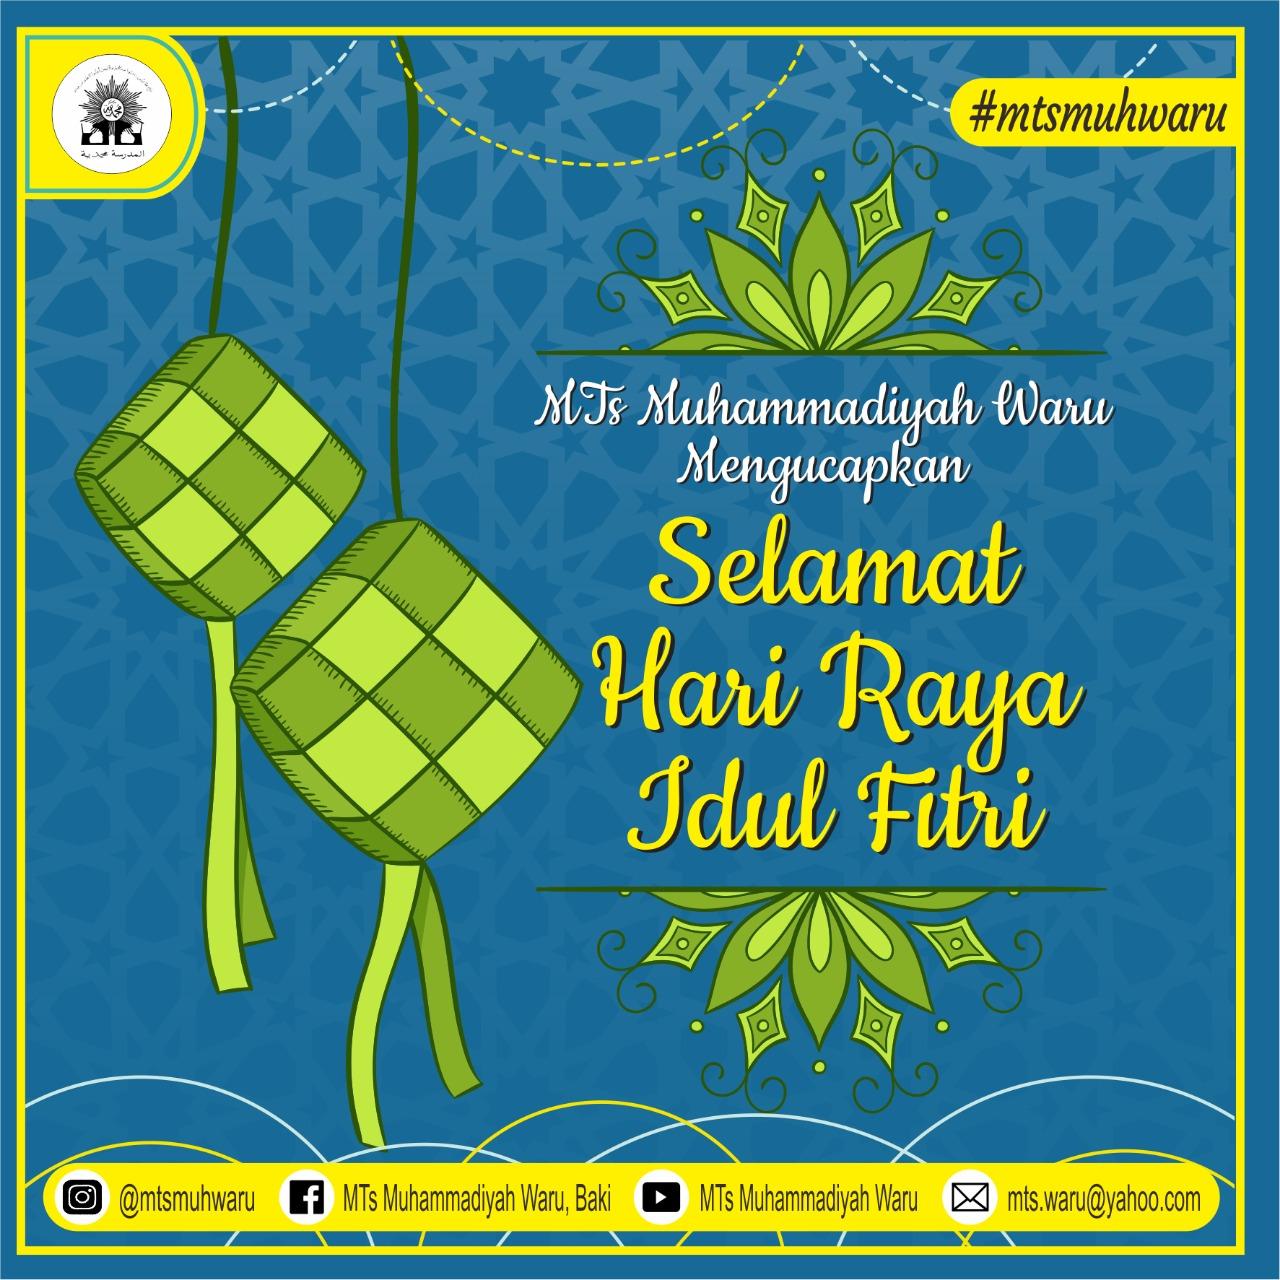 Contoh Spanduk Banner Idul Fitri 1439h 2019 Rafsablog Id